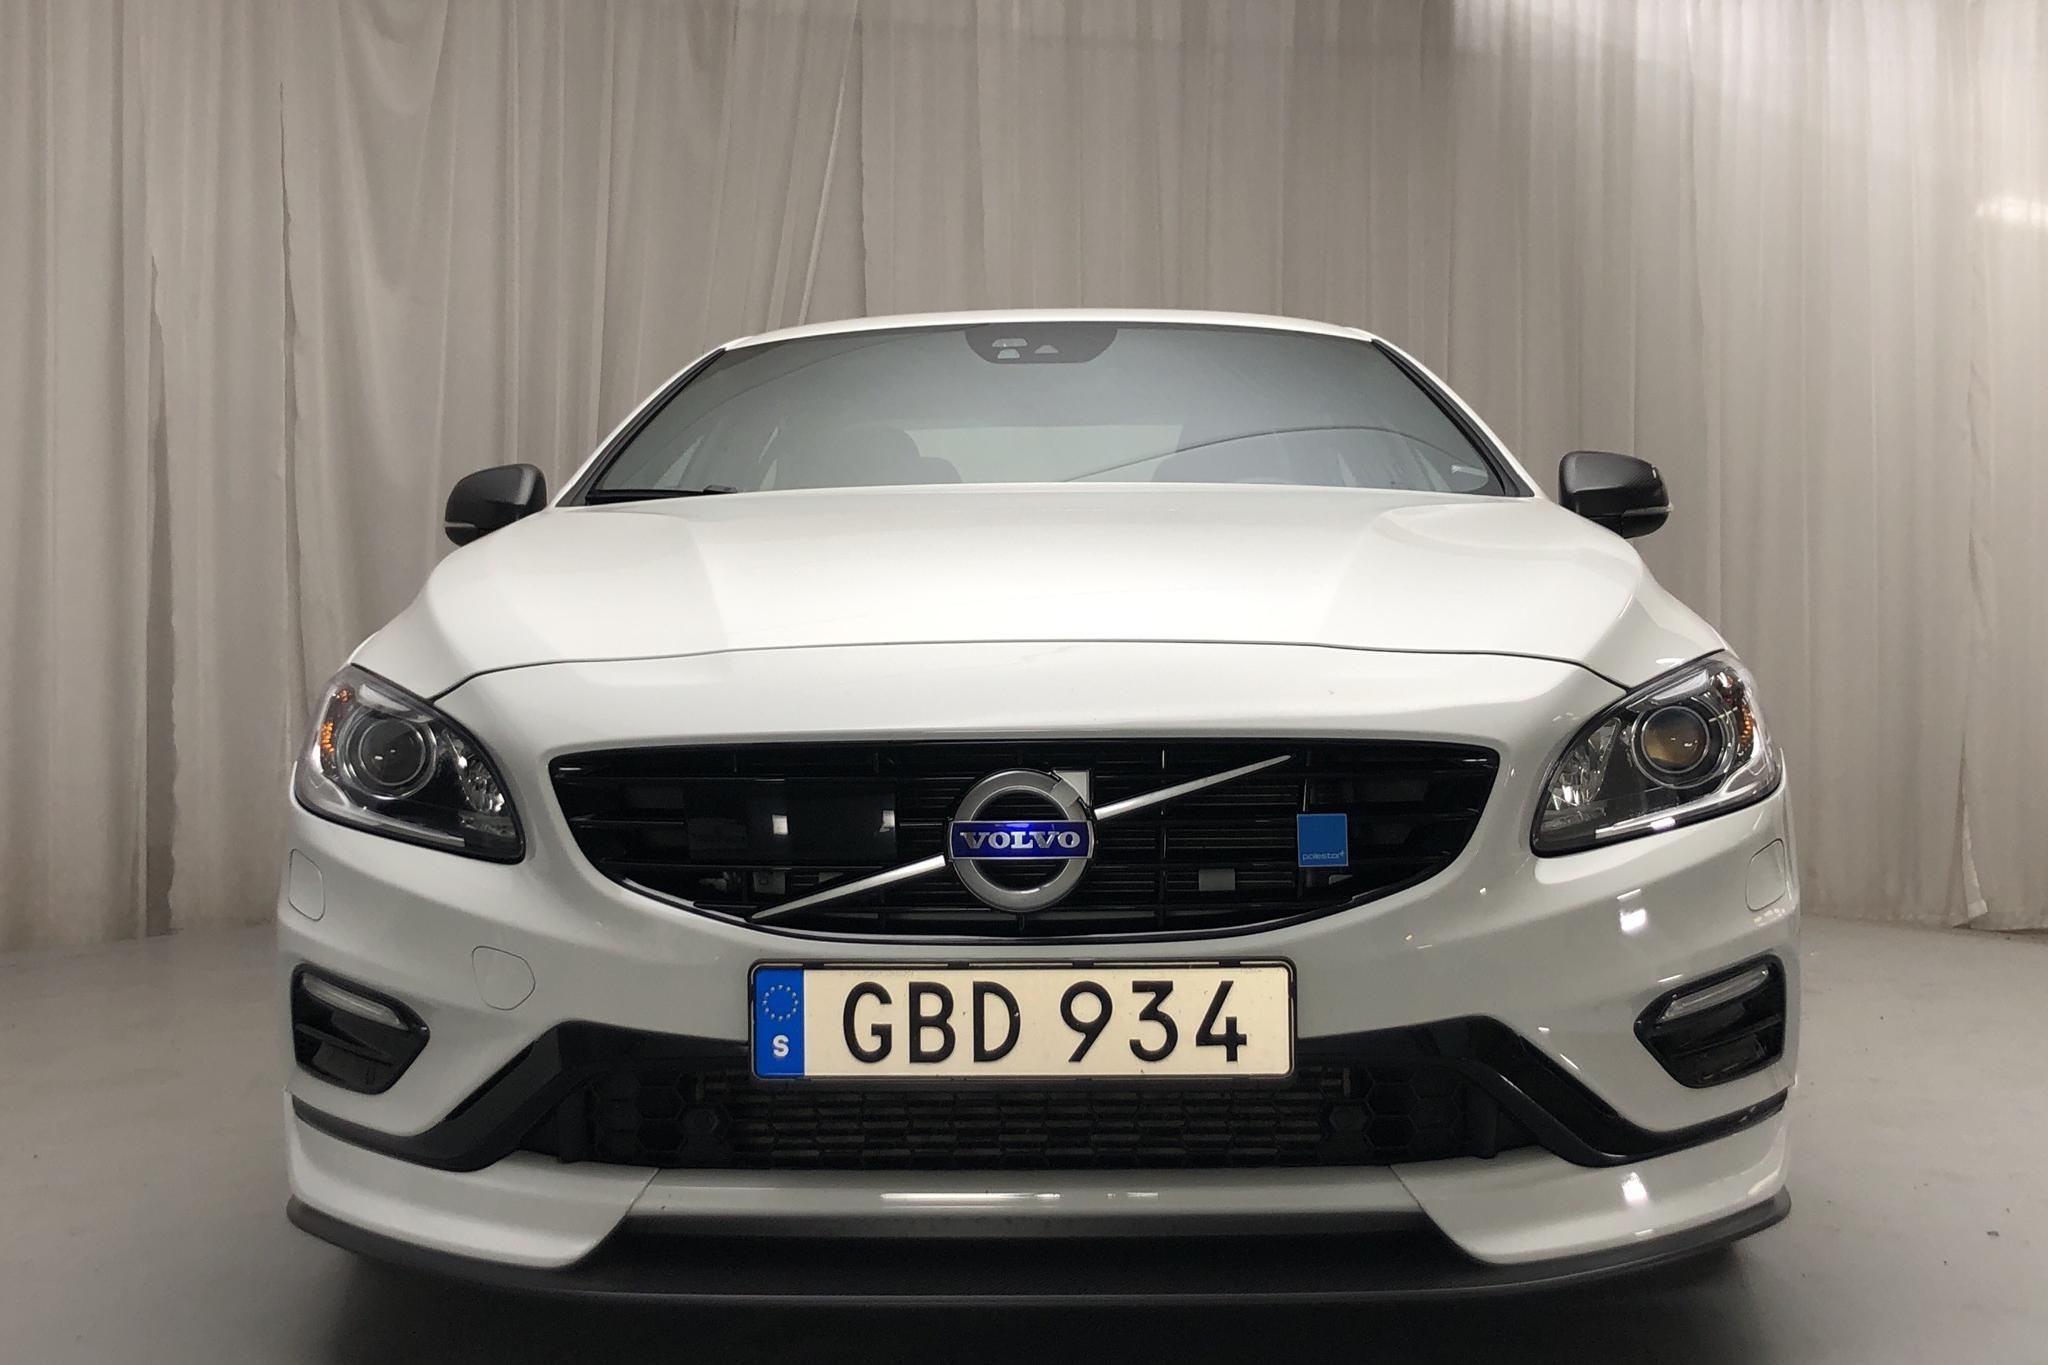 Volvo S60 T6 AWD Polestar (367hk) - 25 860 km - Automatic - white - 2018